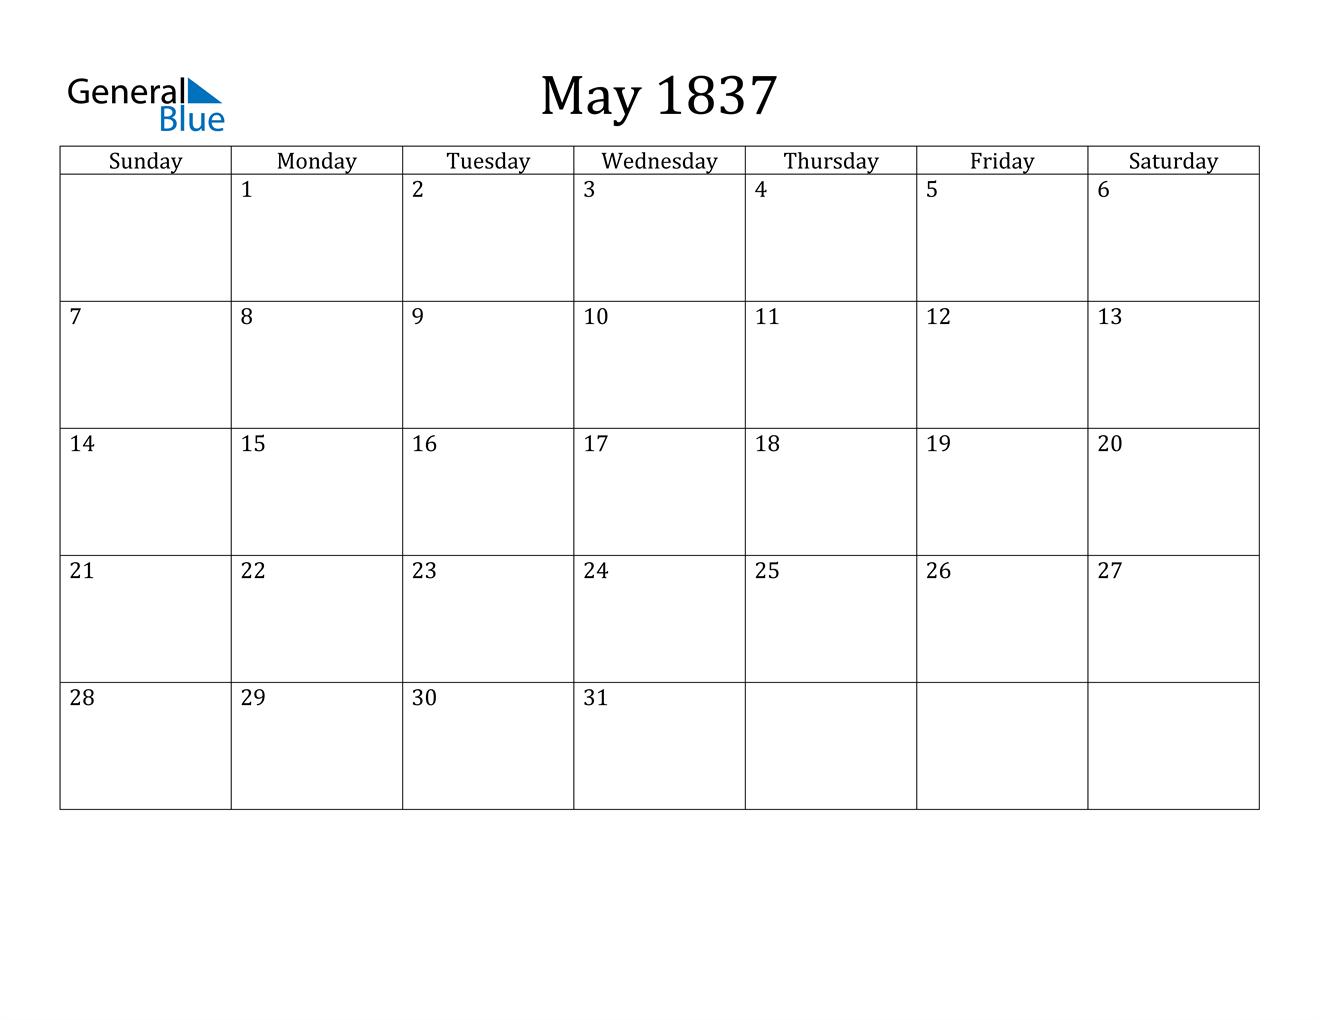 Image of May 1837 Calendar